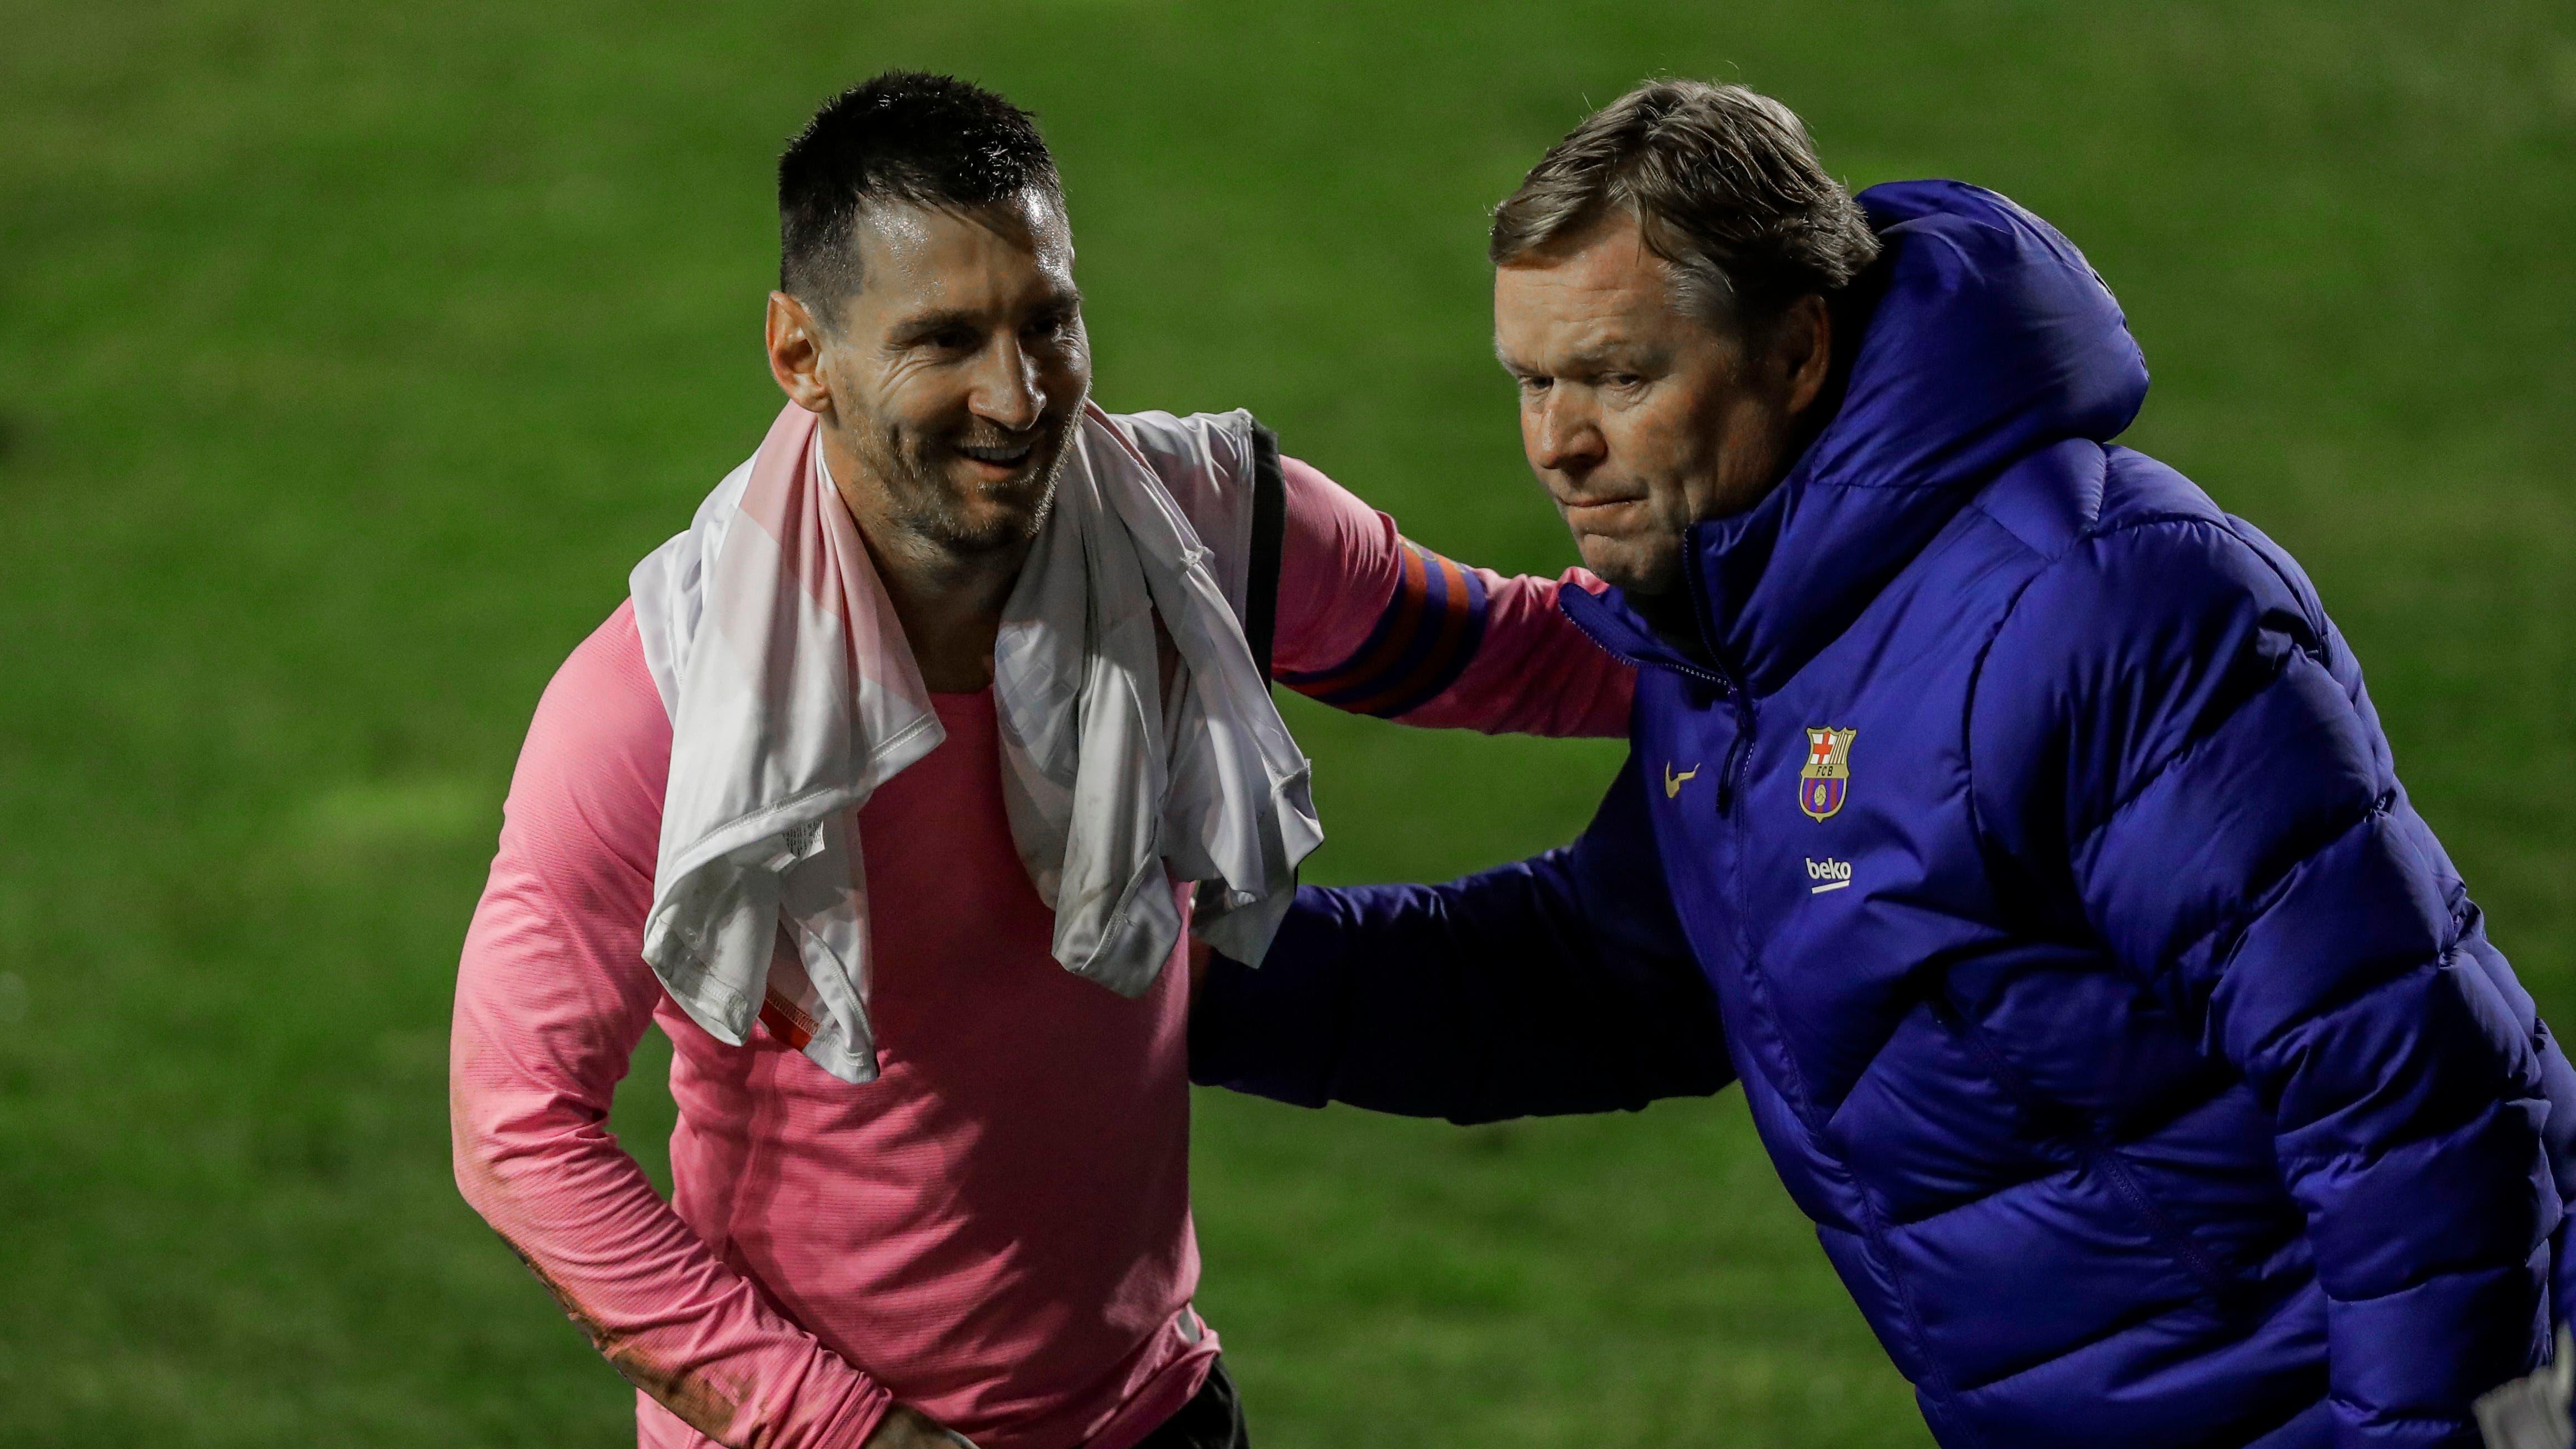 Lionel Messi scores on return as Barcelona defeat Rayo Vallecano in Copa del Rey